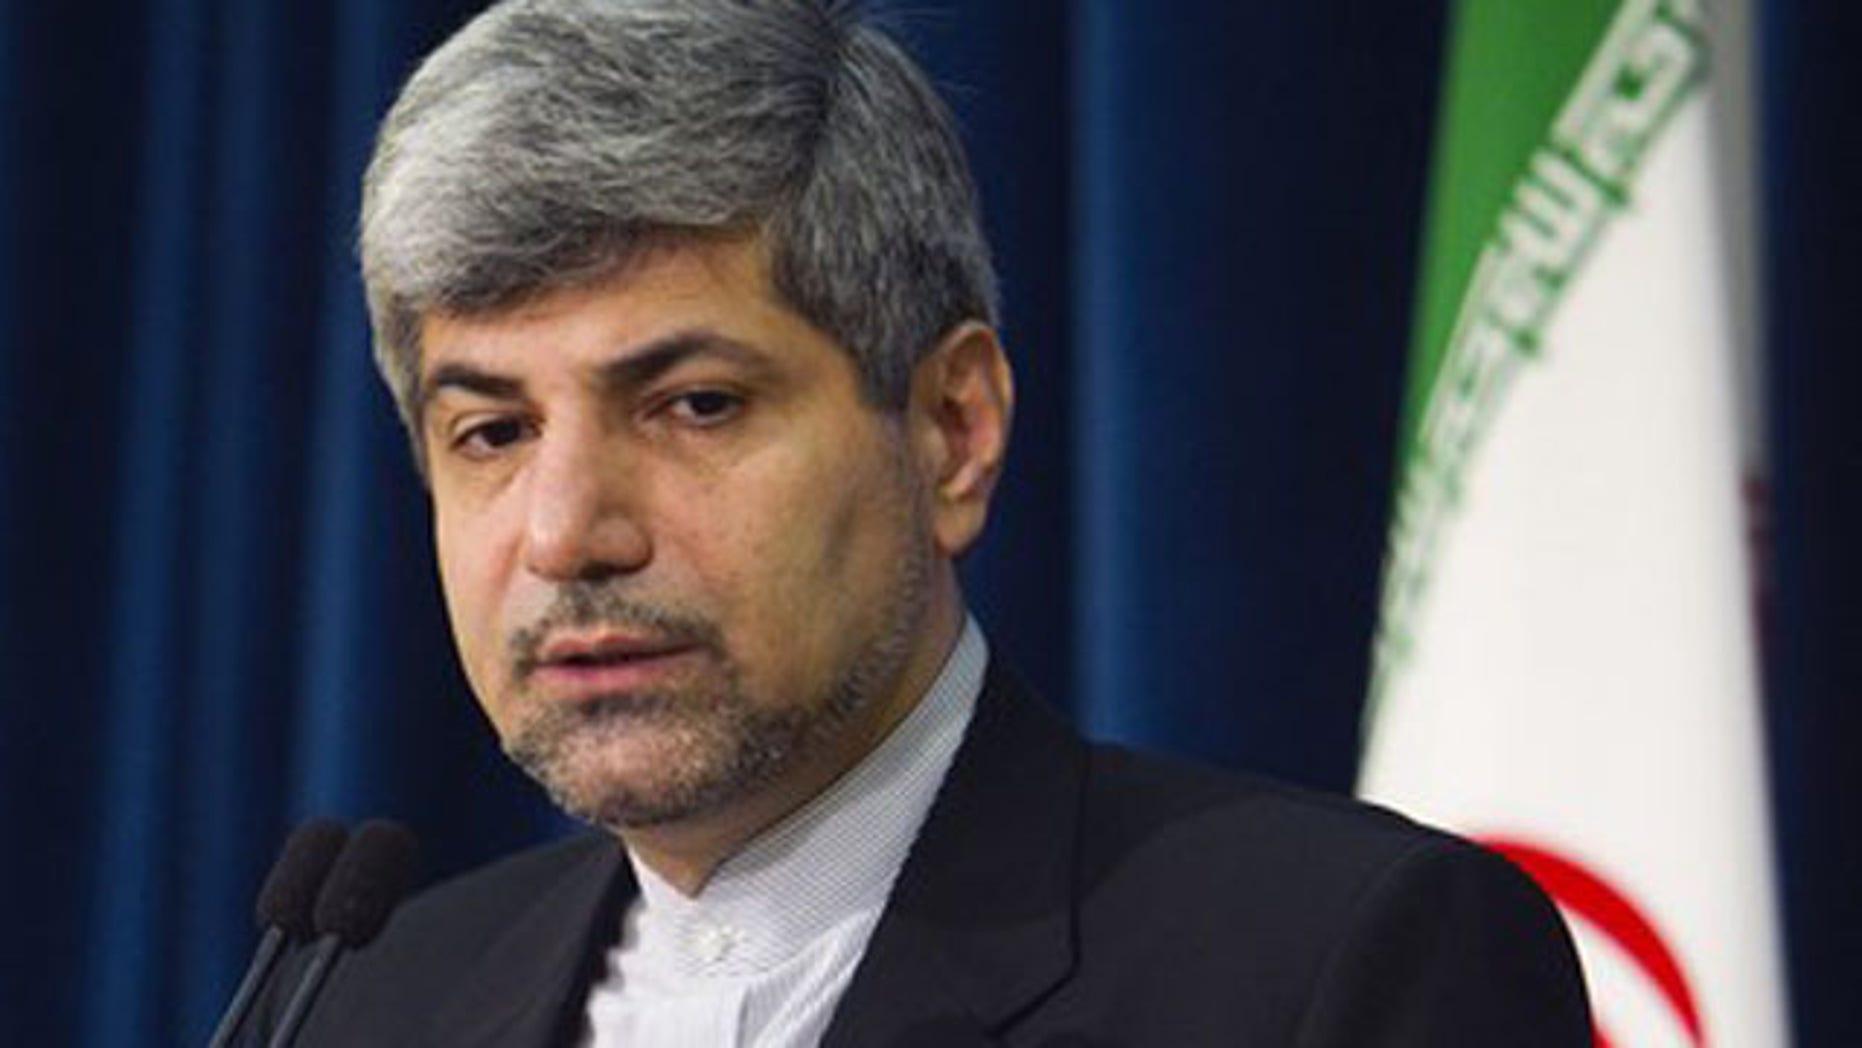 Jun. 28, 2011: Iran's Foreign Ministry spokesman Ramin Mehmanparast speaks to the media in Tehran.